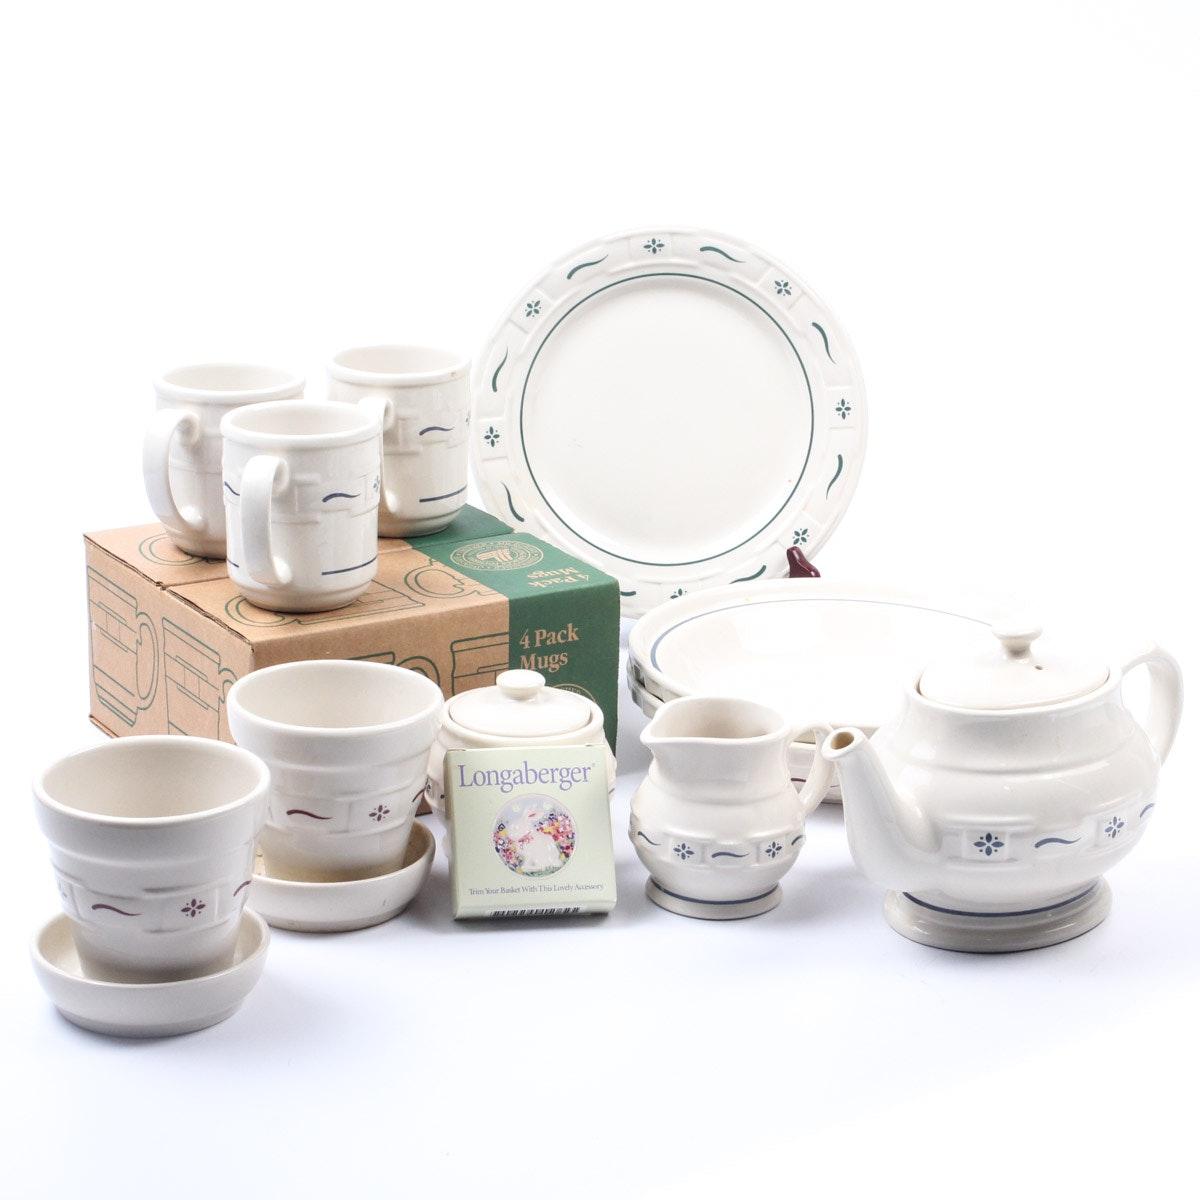 Collection of Longaberger Ceramics